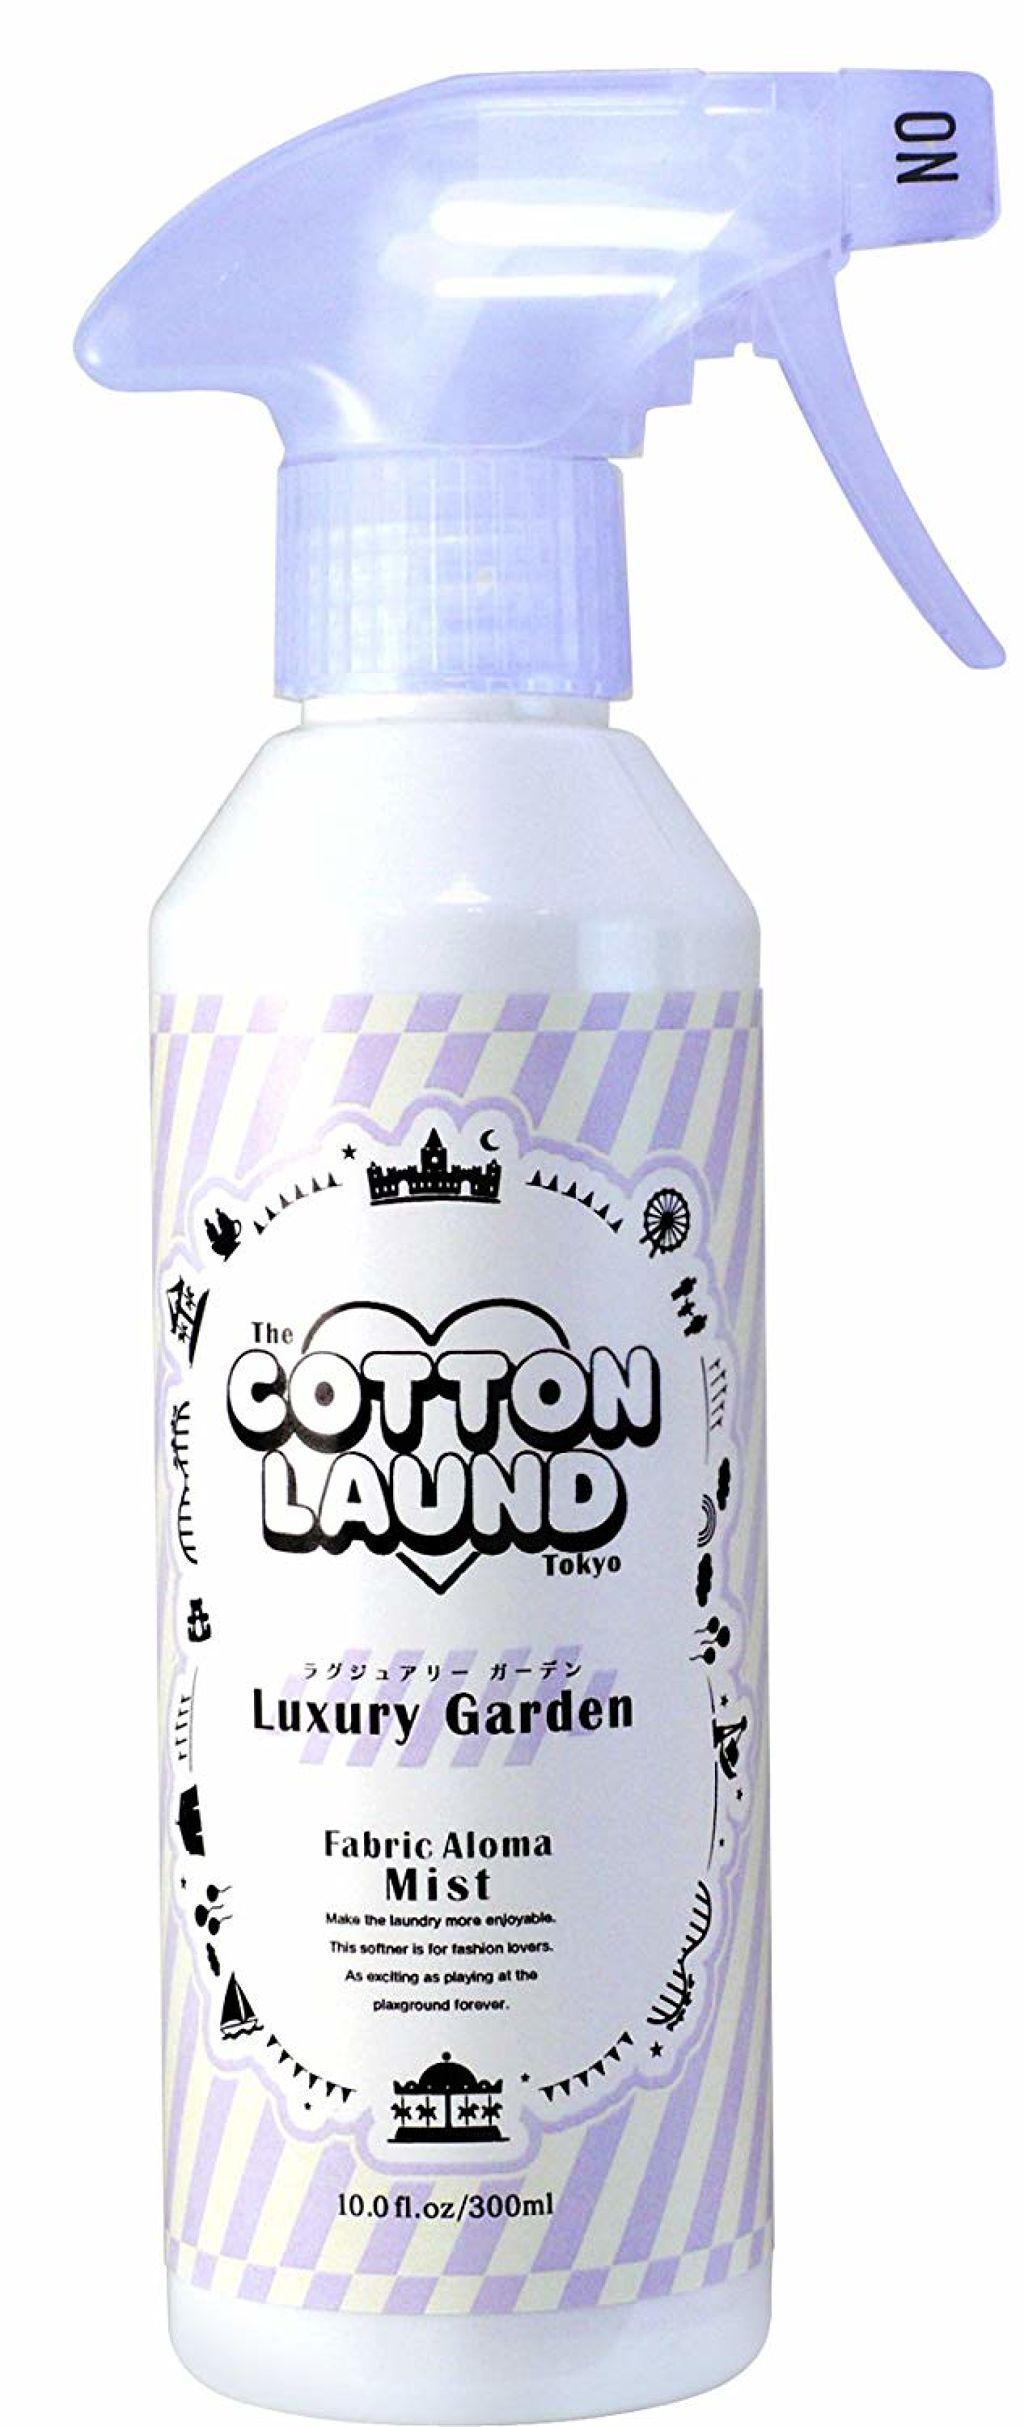 Cotton Laund (コットンランド)